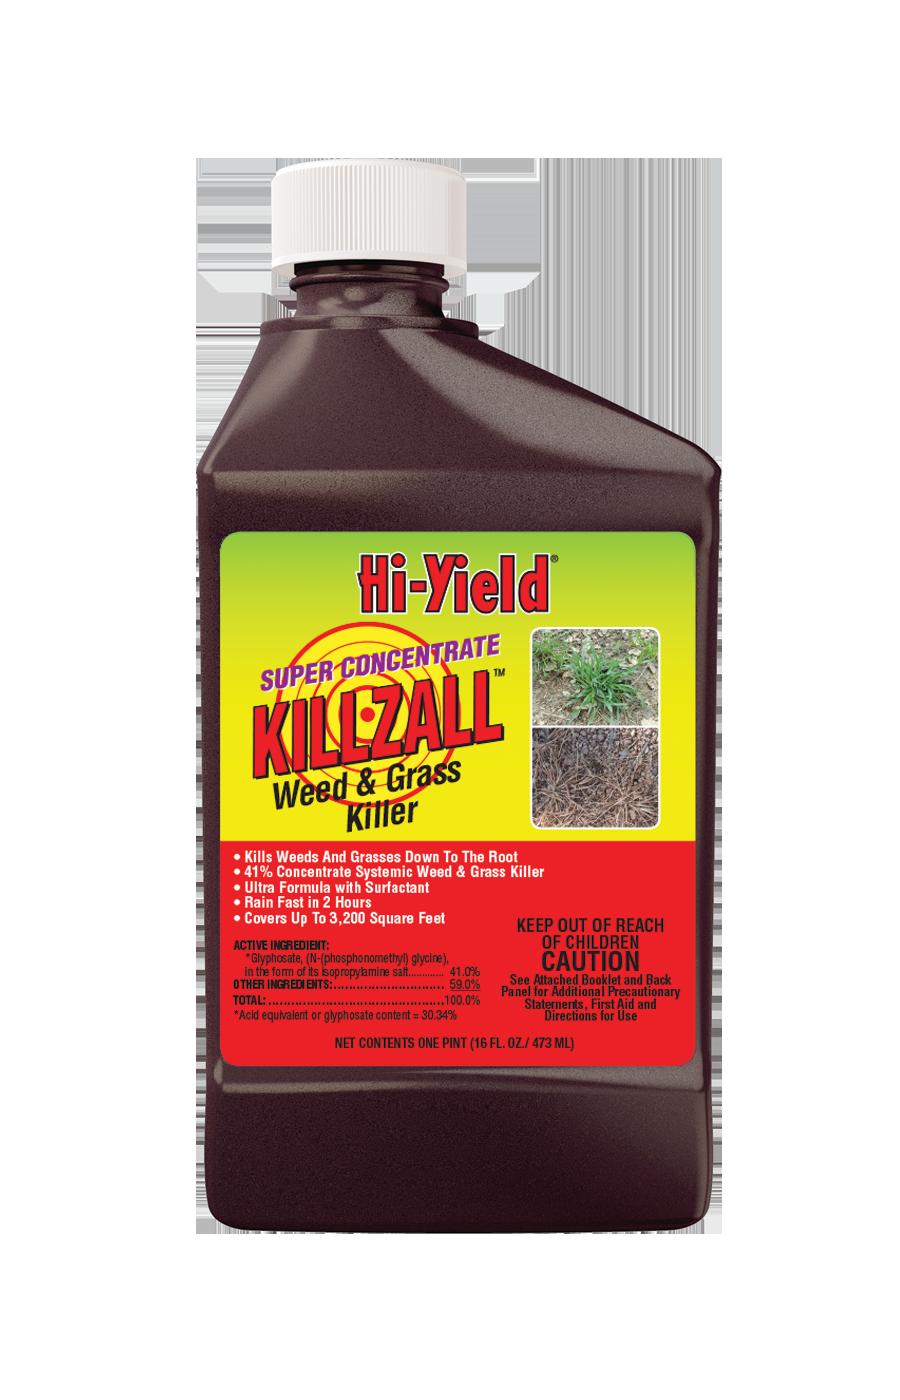 Killzall-Weed-and-Grass-Killer-16oz-33691-Planogram-L.png